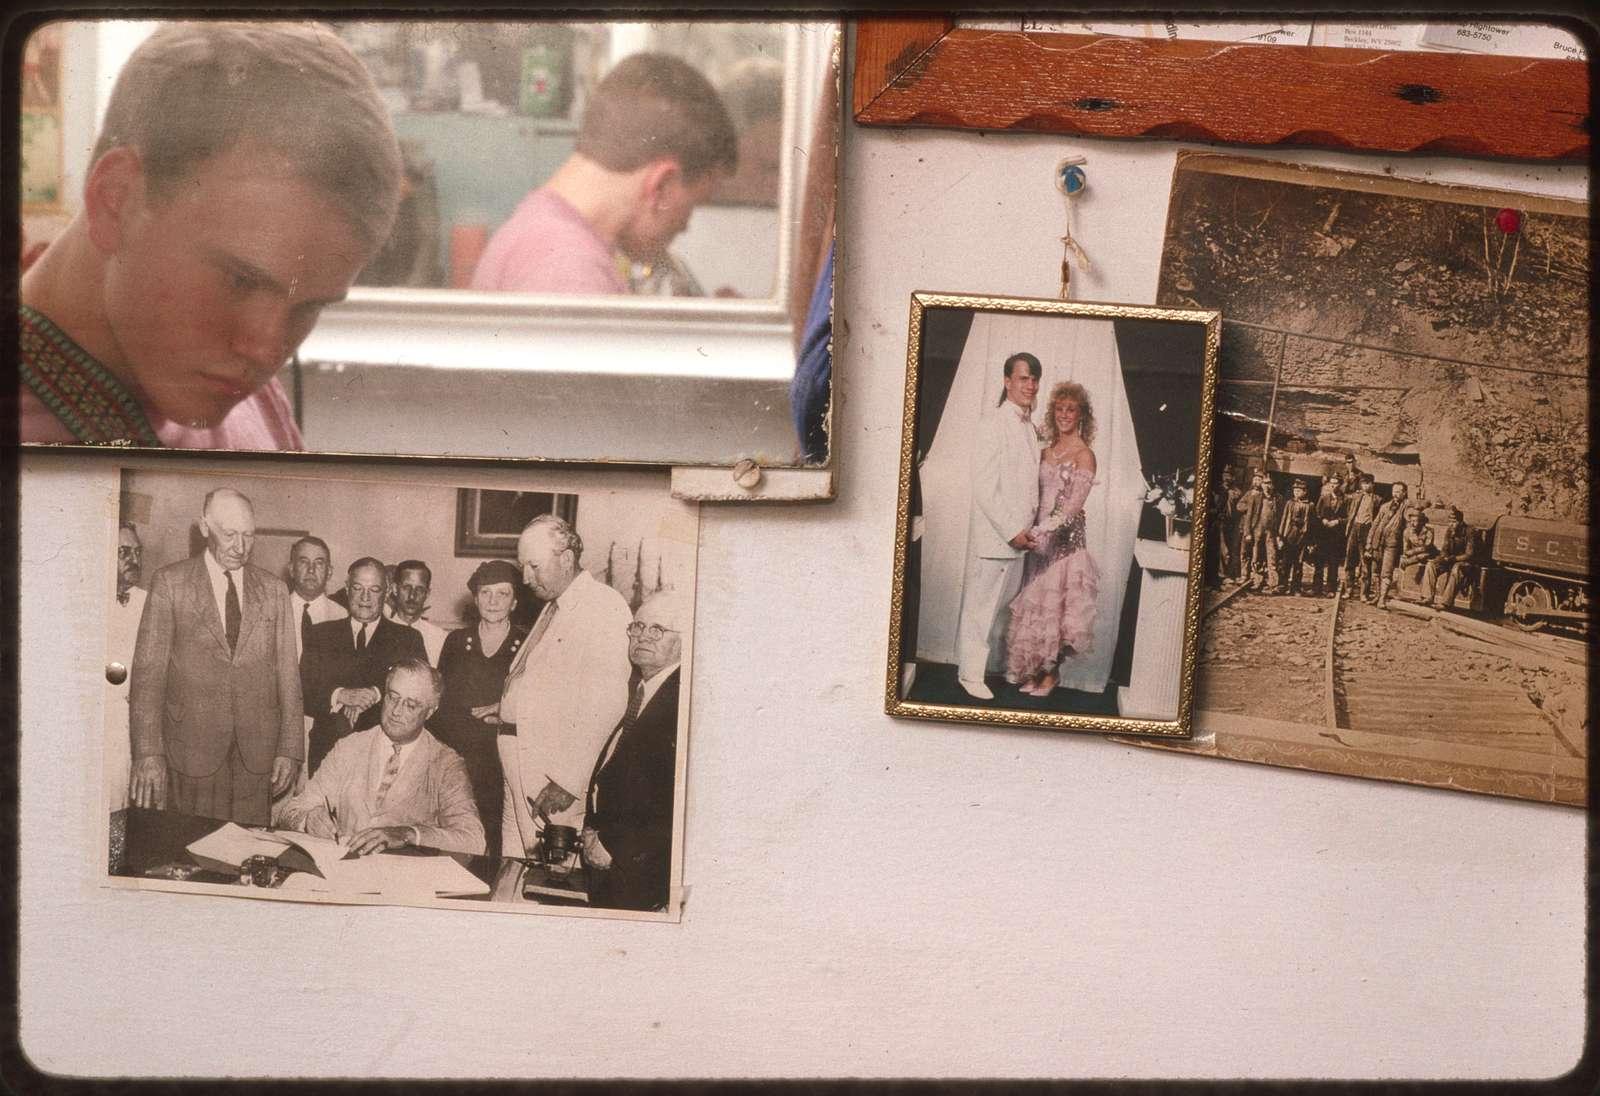 Community memorabilia on the wall of Frazier Gills' barbershop in Coal City